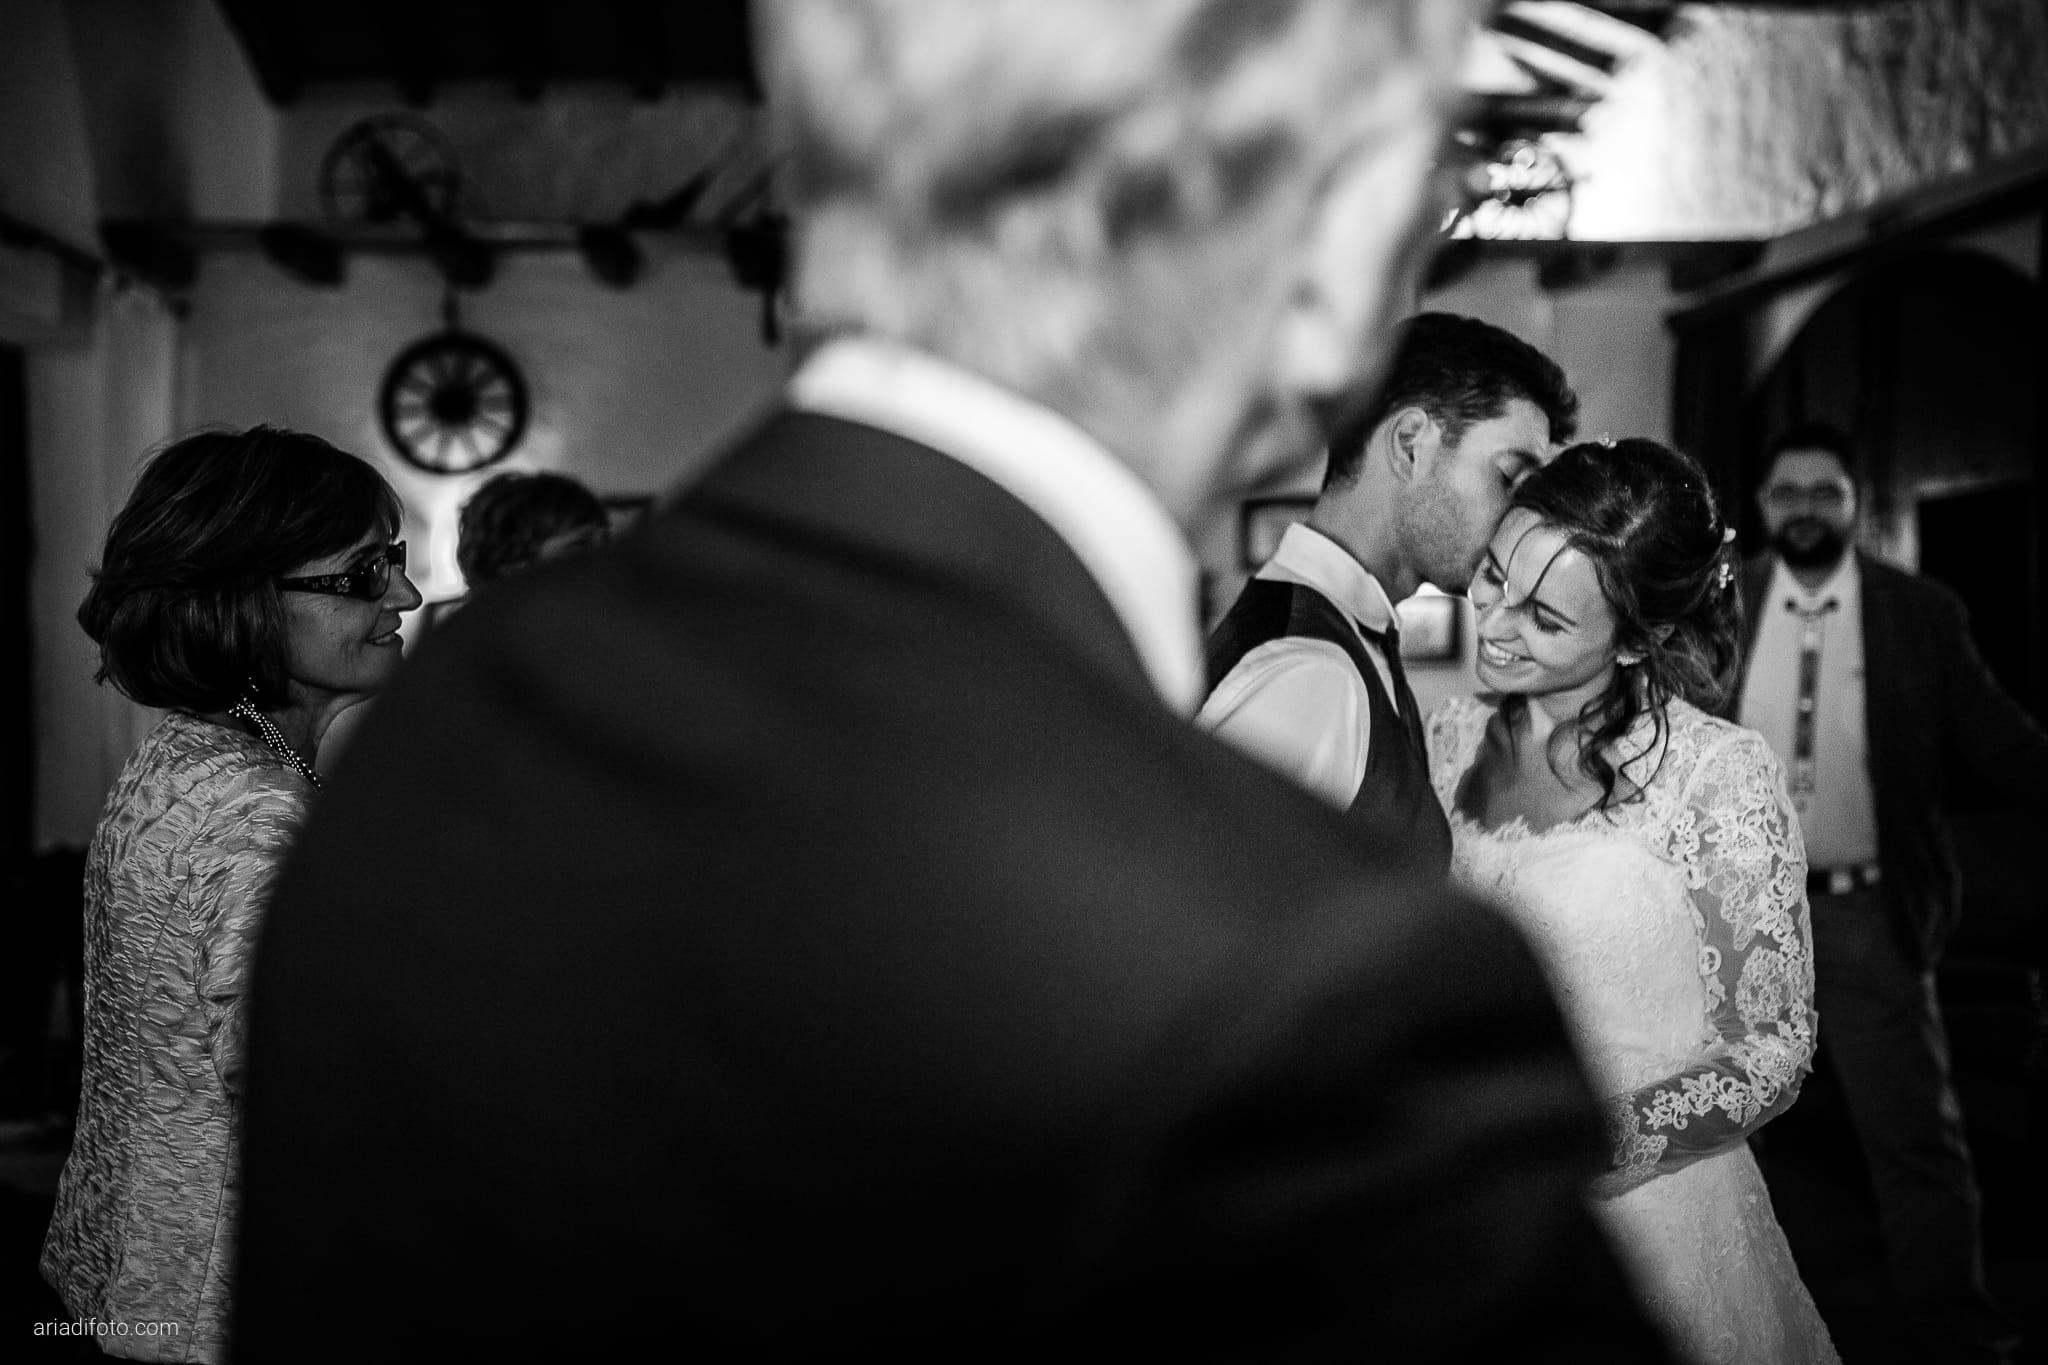 Eleonora Elia Matrimonio Tarcento Udine Baronesse Tacco Gorizia ricevimento festa balli